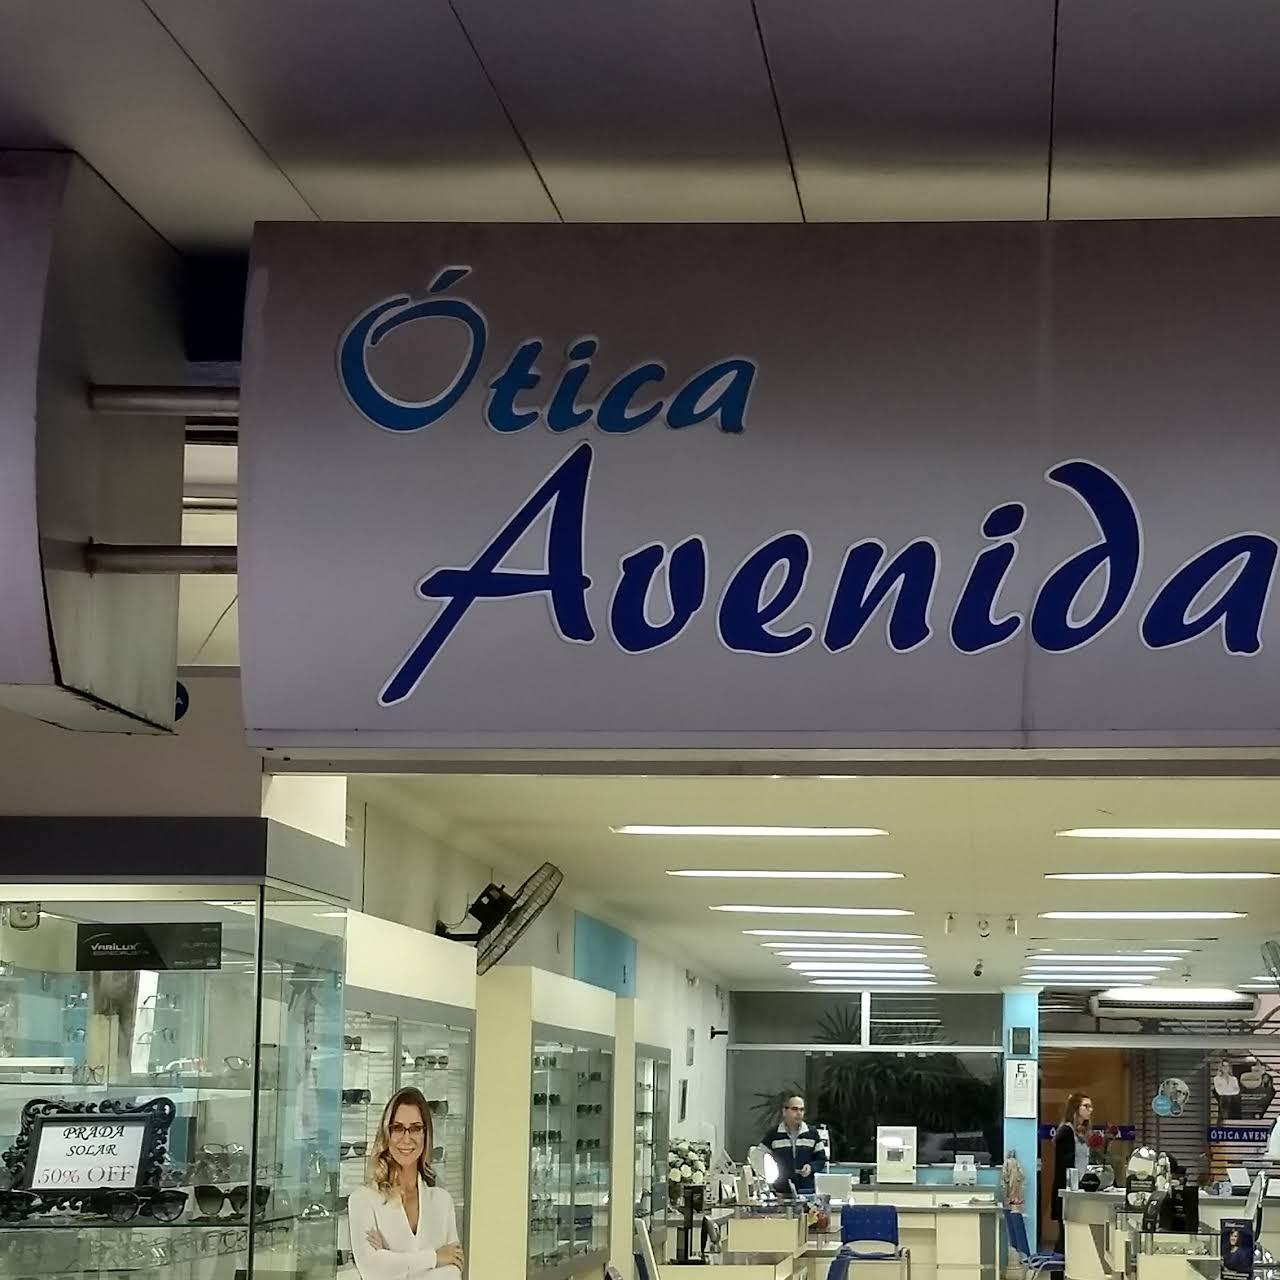 90add03d645f6 Ótica Avenida - Avenida Brasil, 4032